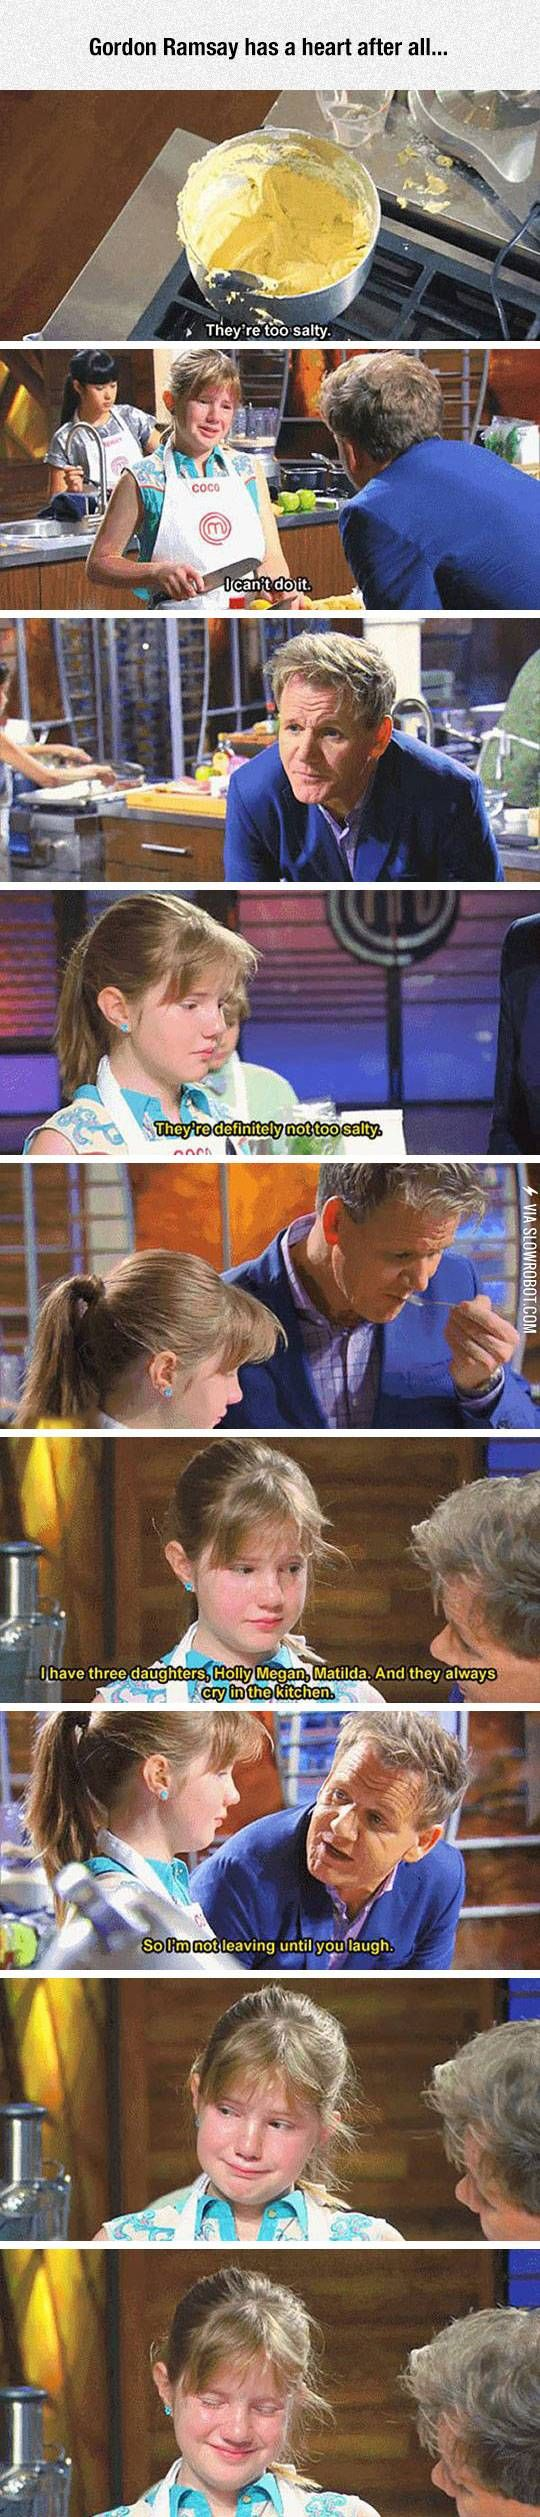 When Gordon Ramsay Shows His Good Side